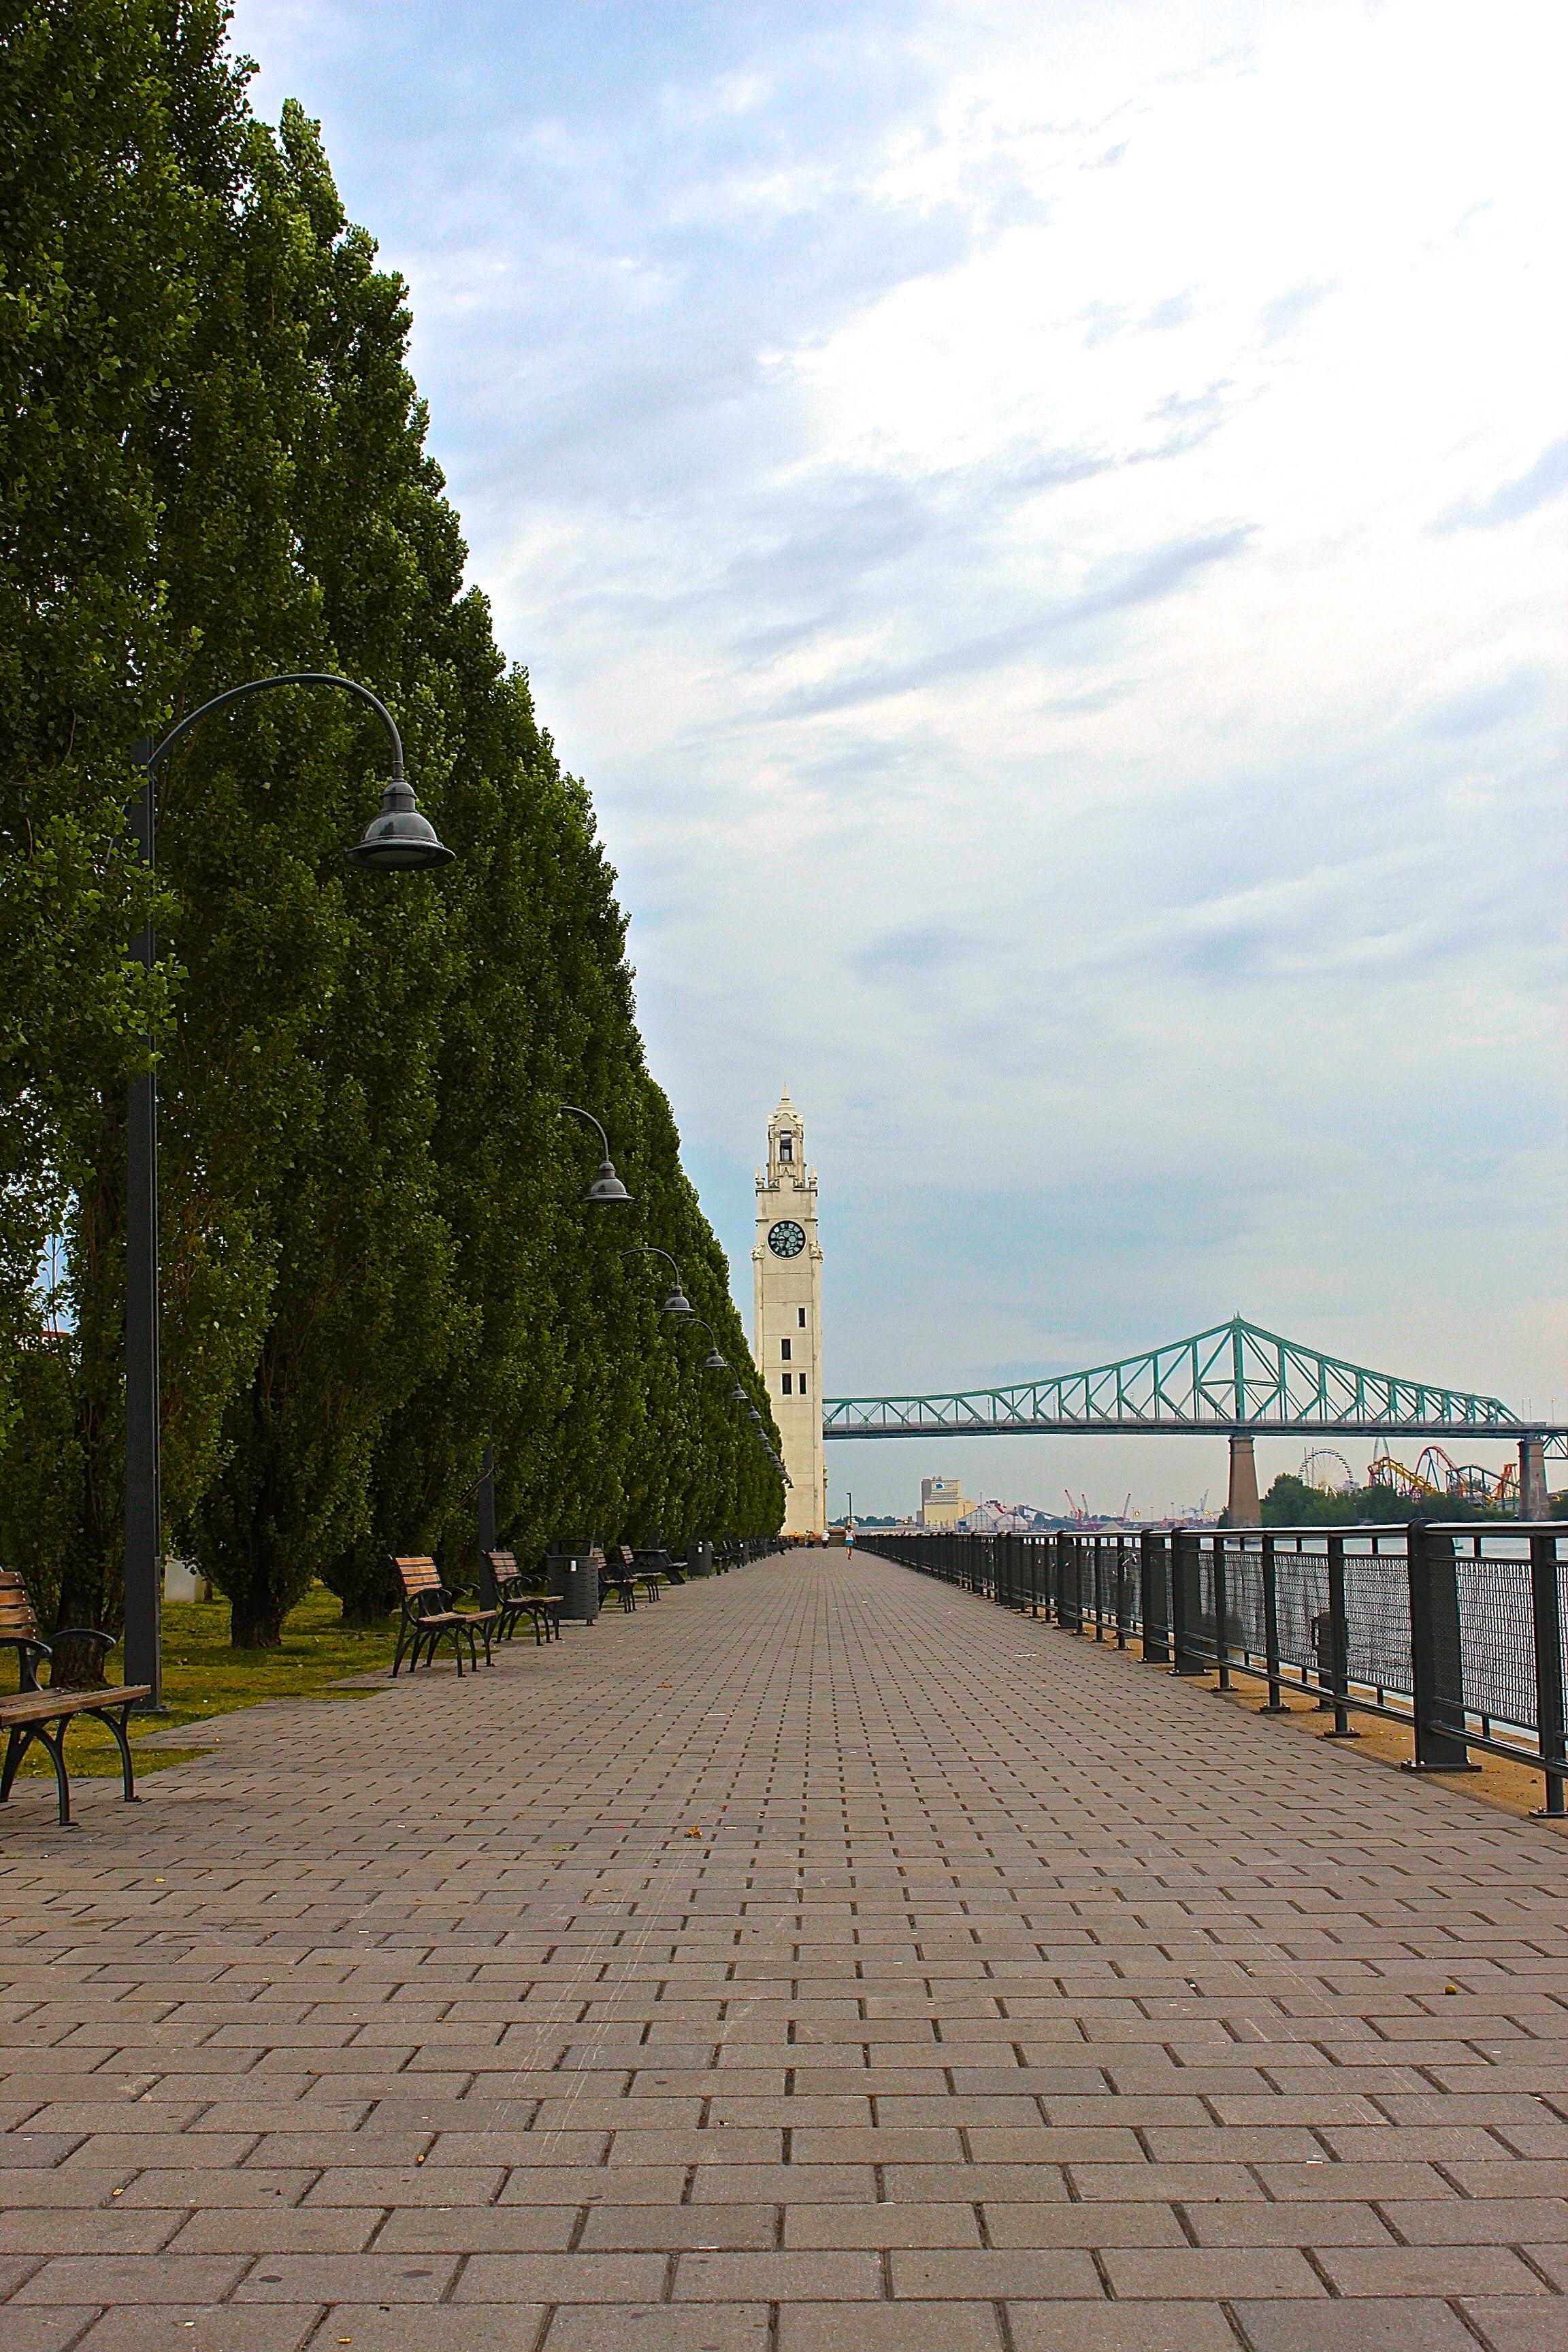 Harbourfront, Clock Tower & Bridge (empty space)